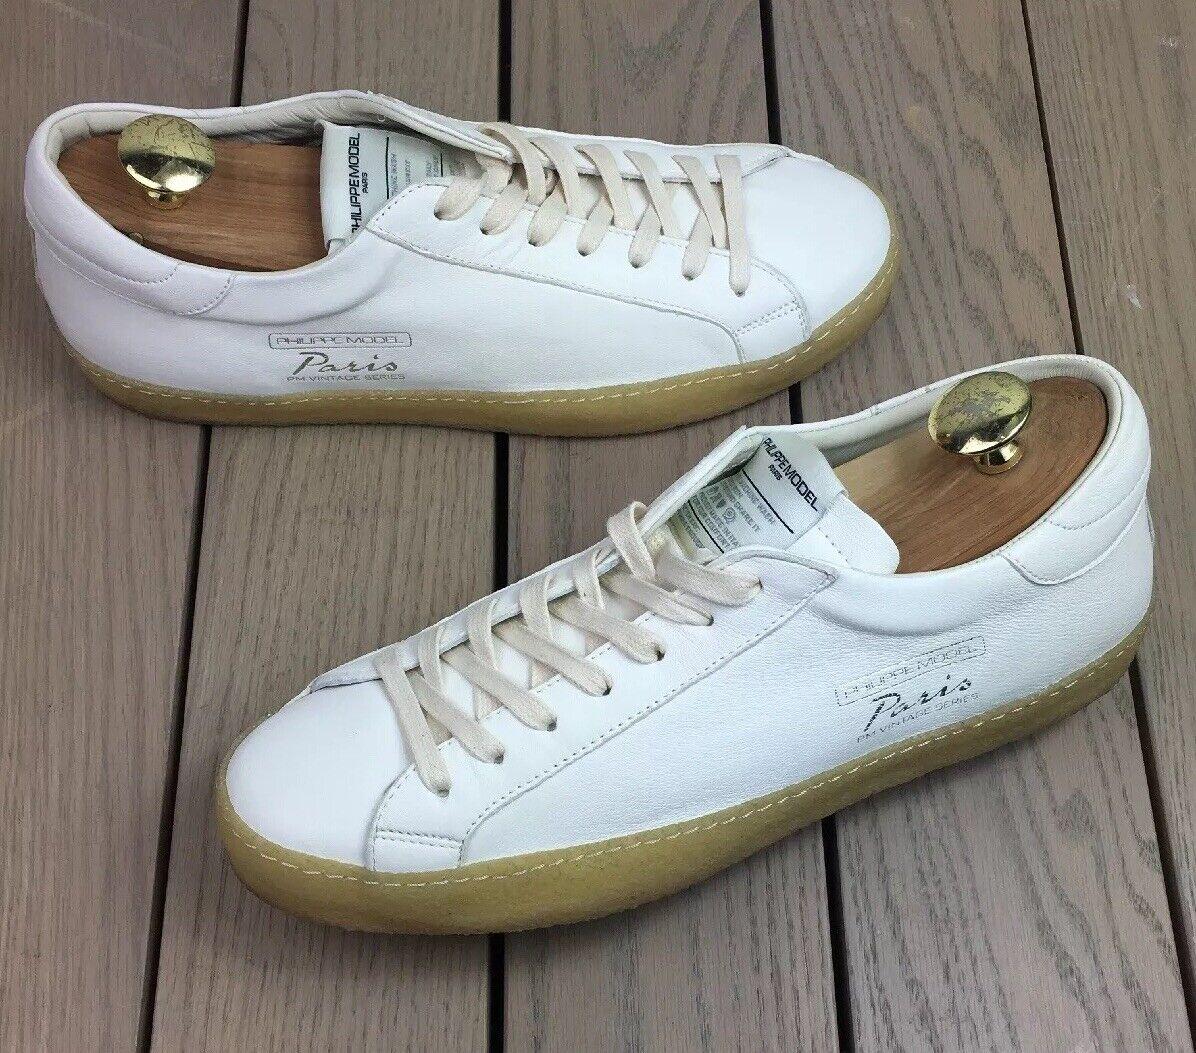 PHILIPPE MODEL uomo scarpe LOW TOP LEATHER TRAINERS scarpe da ginnastica PARIS bianca Sz 44